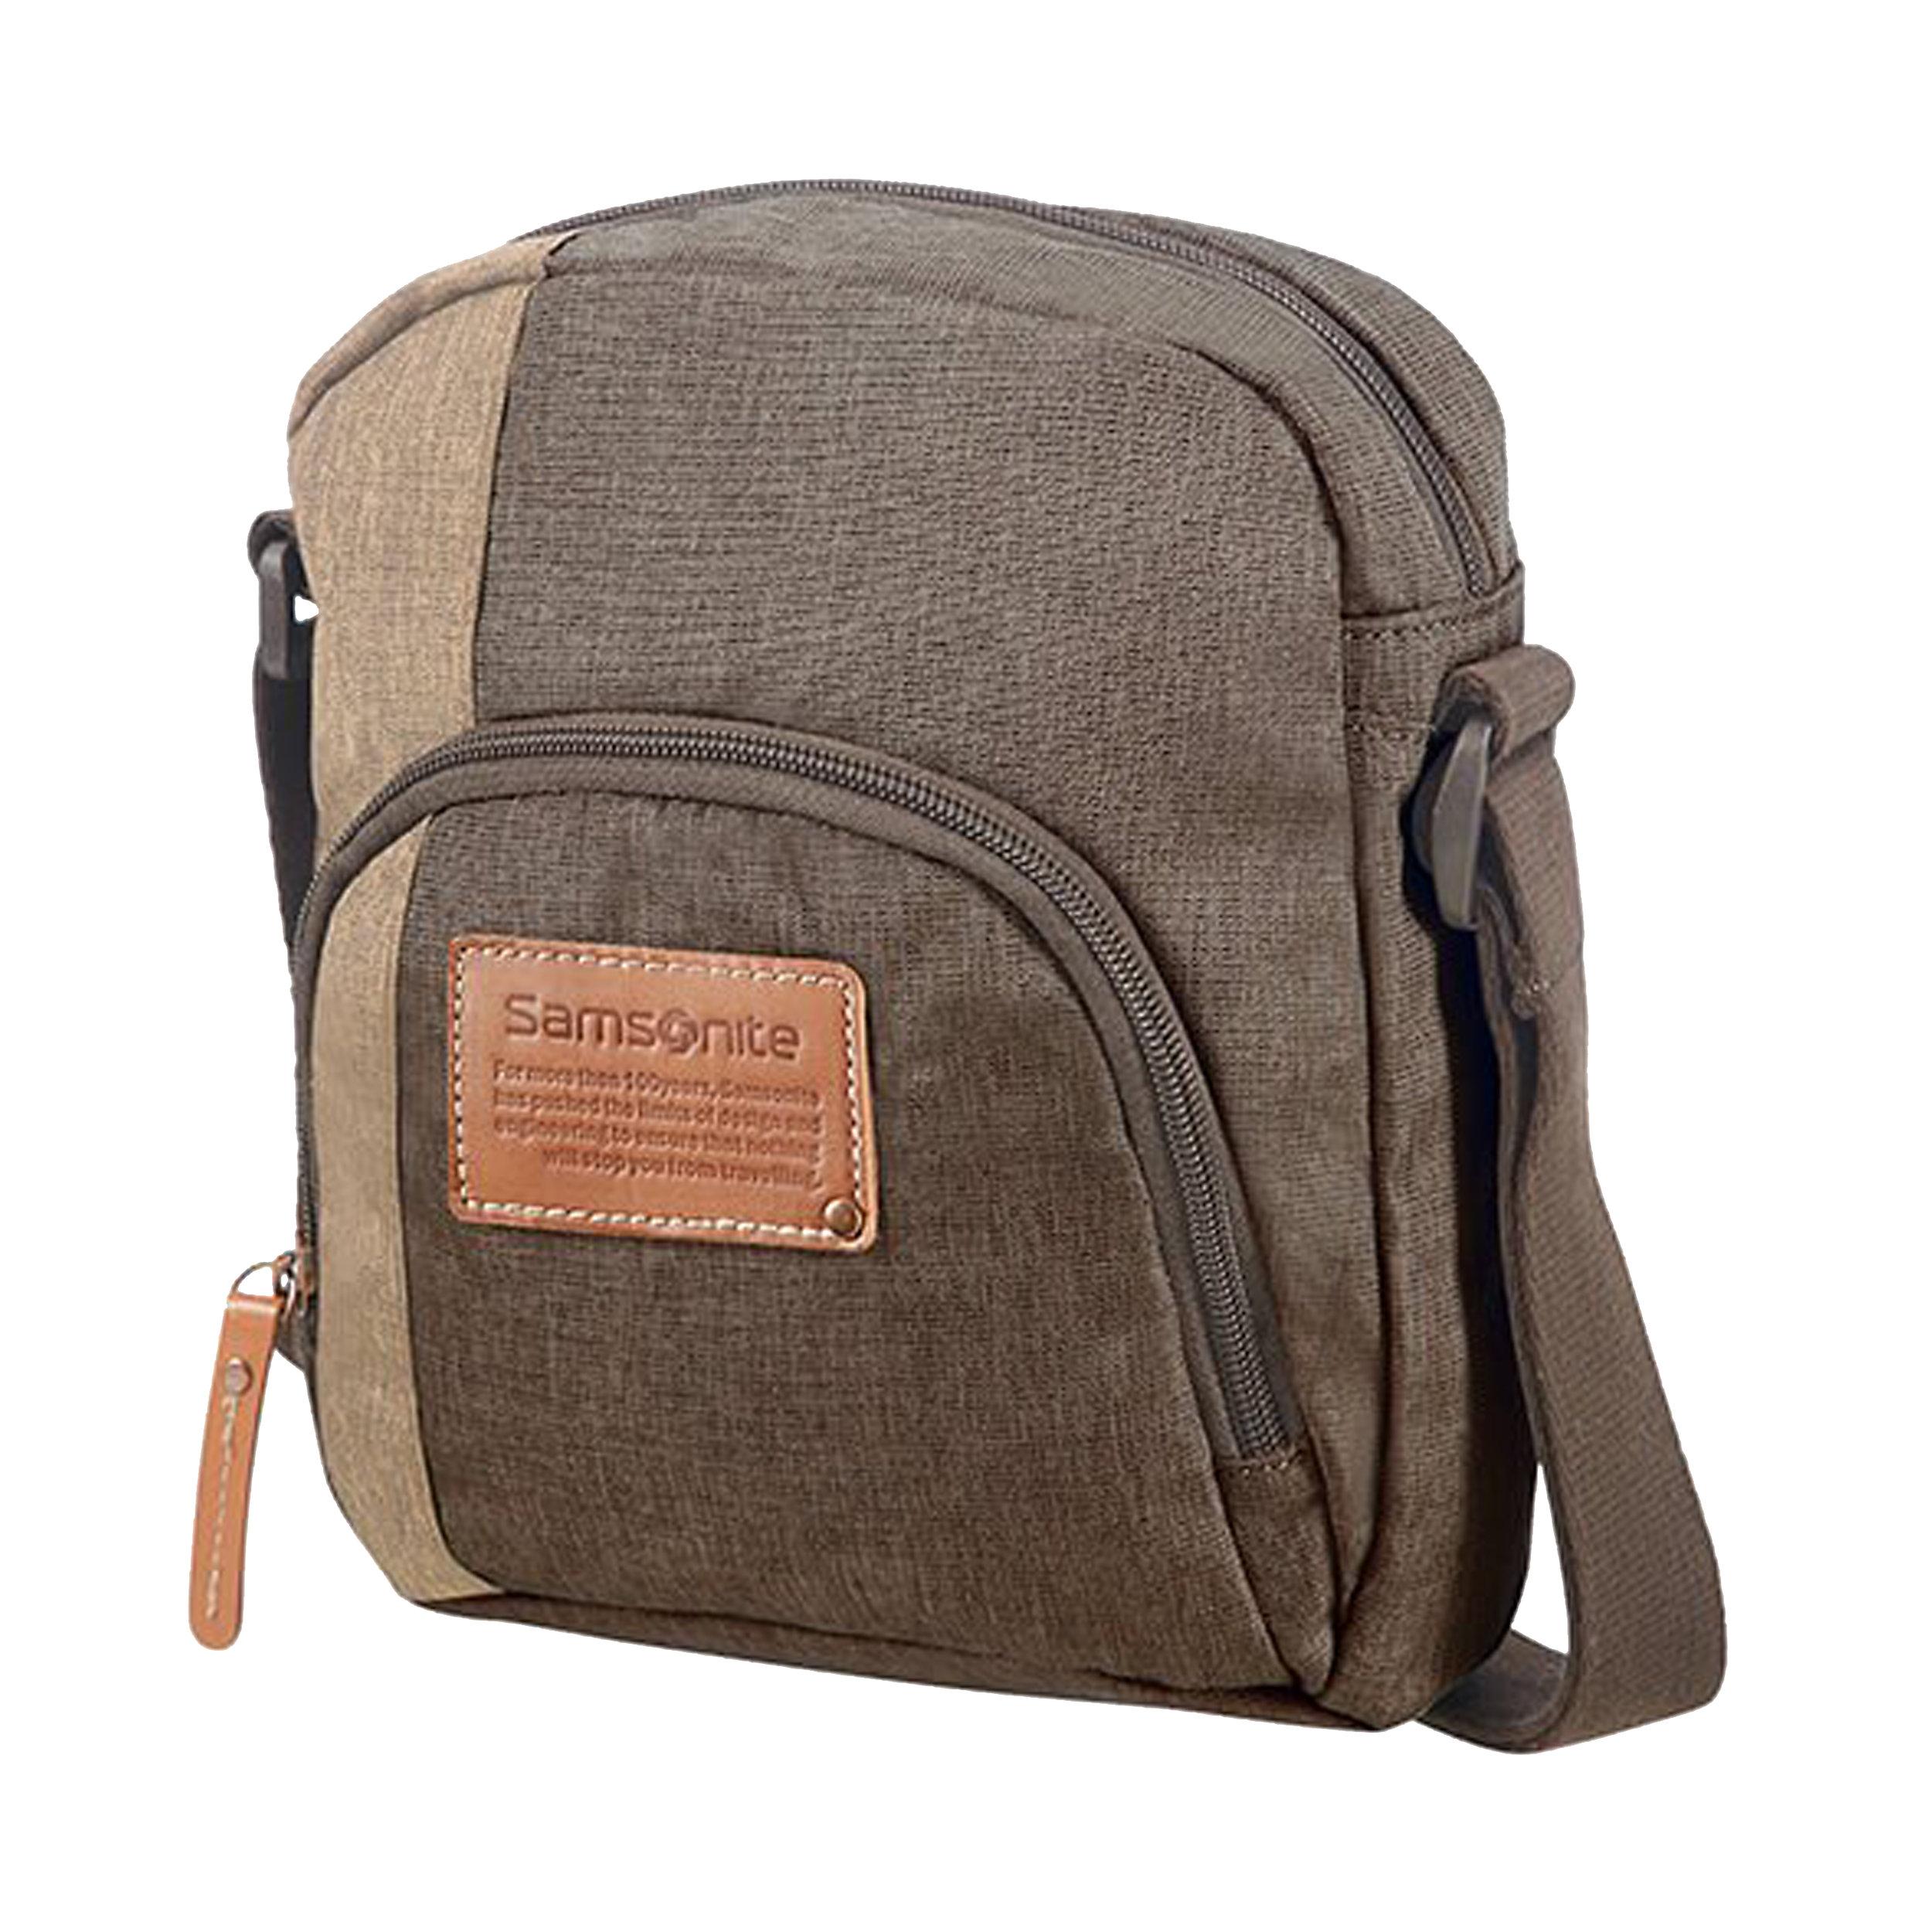 Crossbody Bag Rewind Natural 4.5 Liter